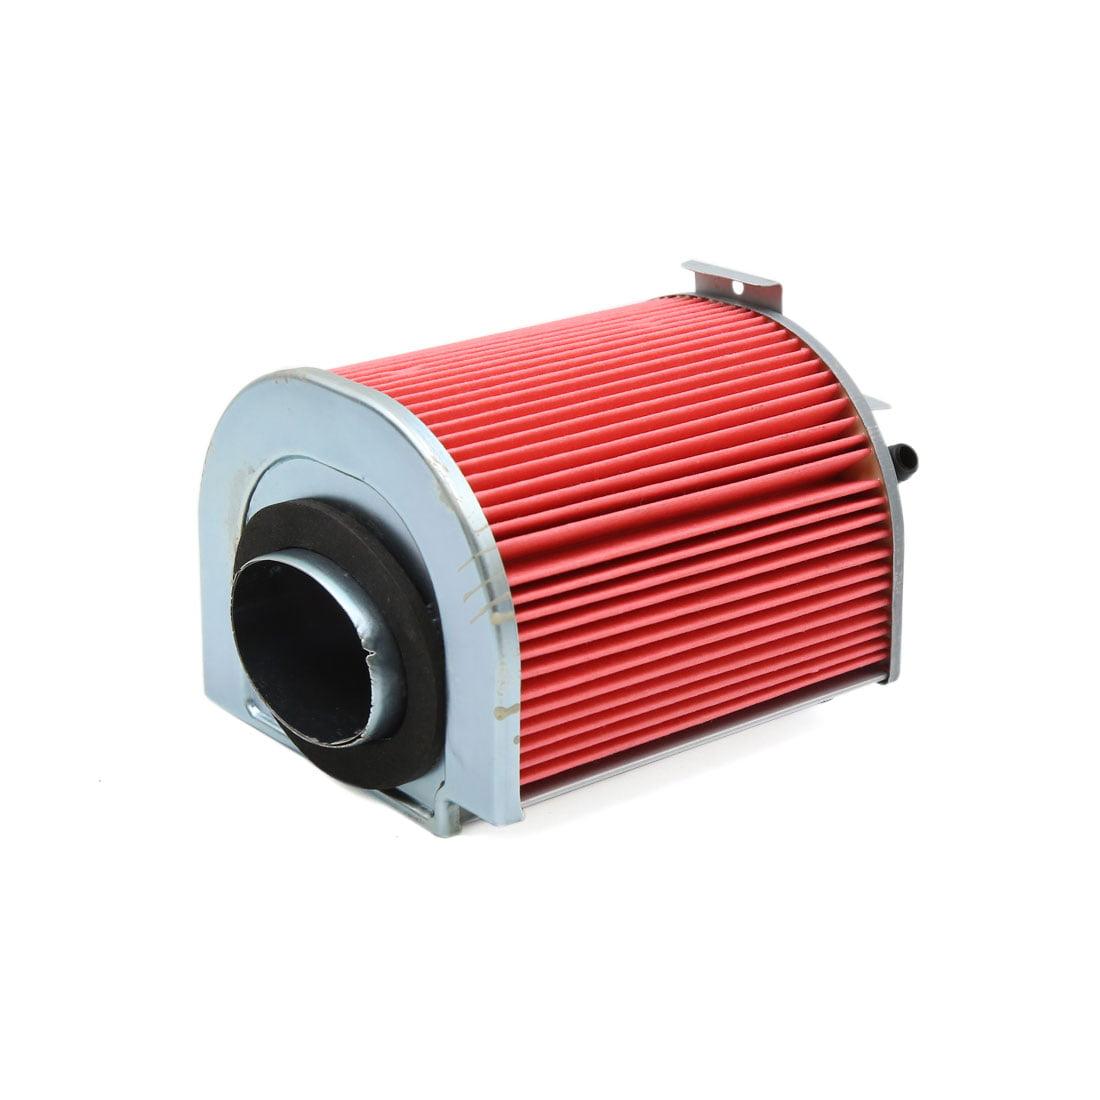 Motorcycle Air Intake Filter Cleaner for 92-02  CB250 91-00 Nightawk